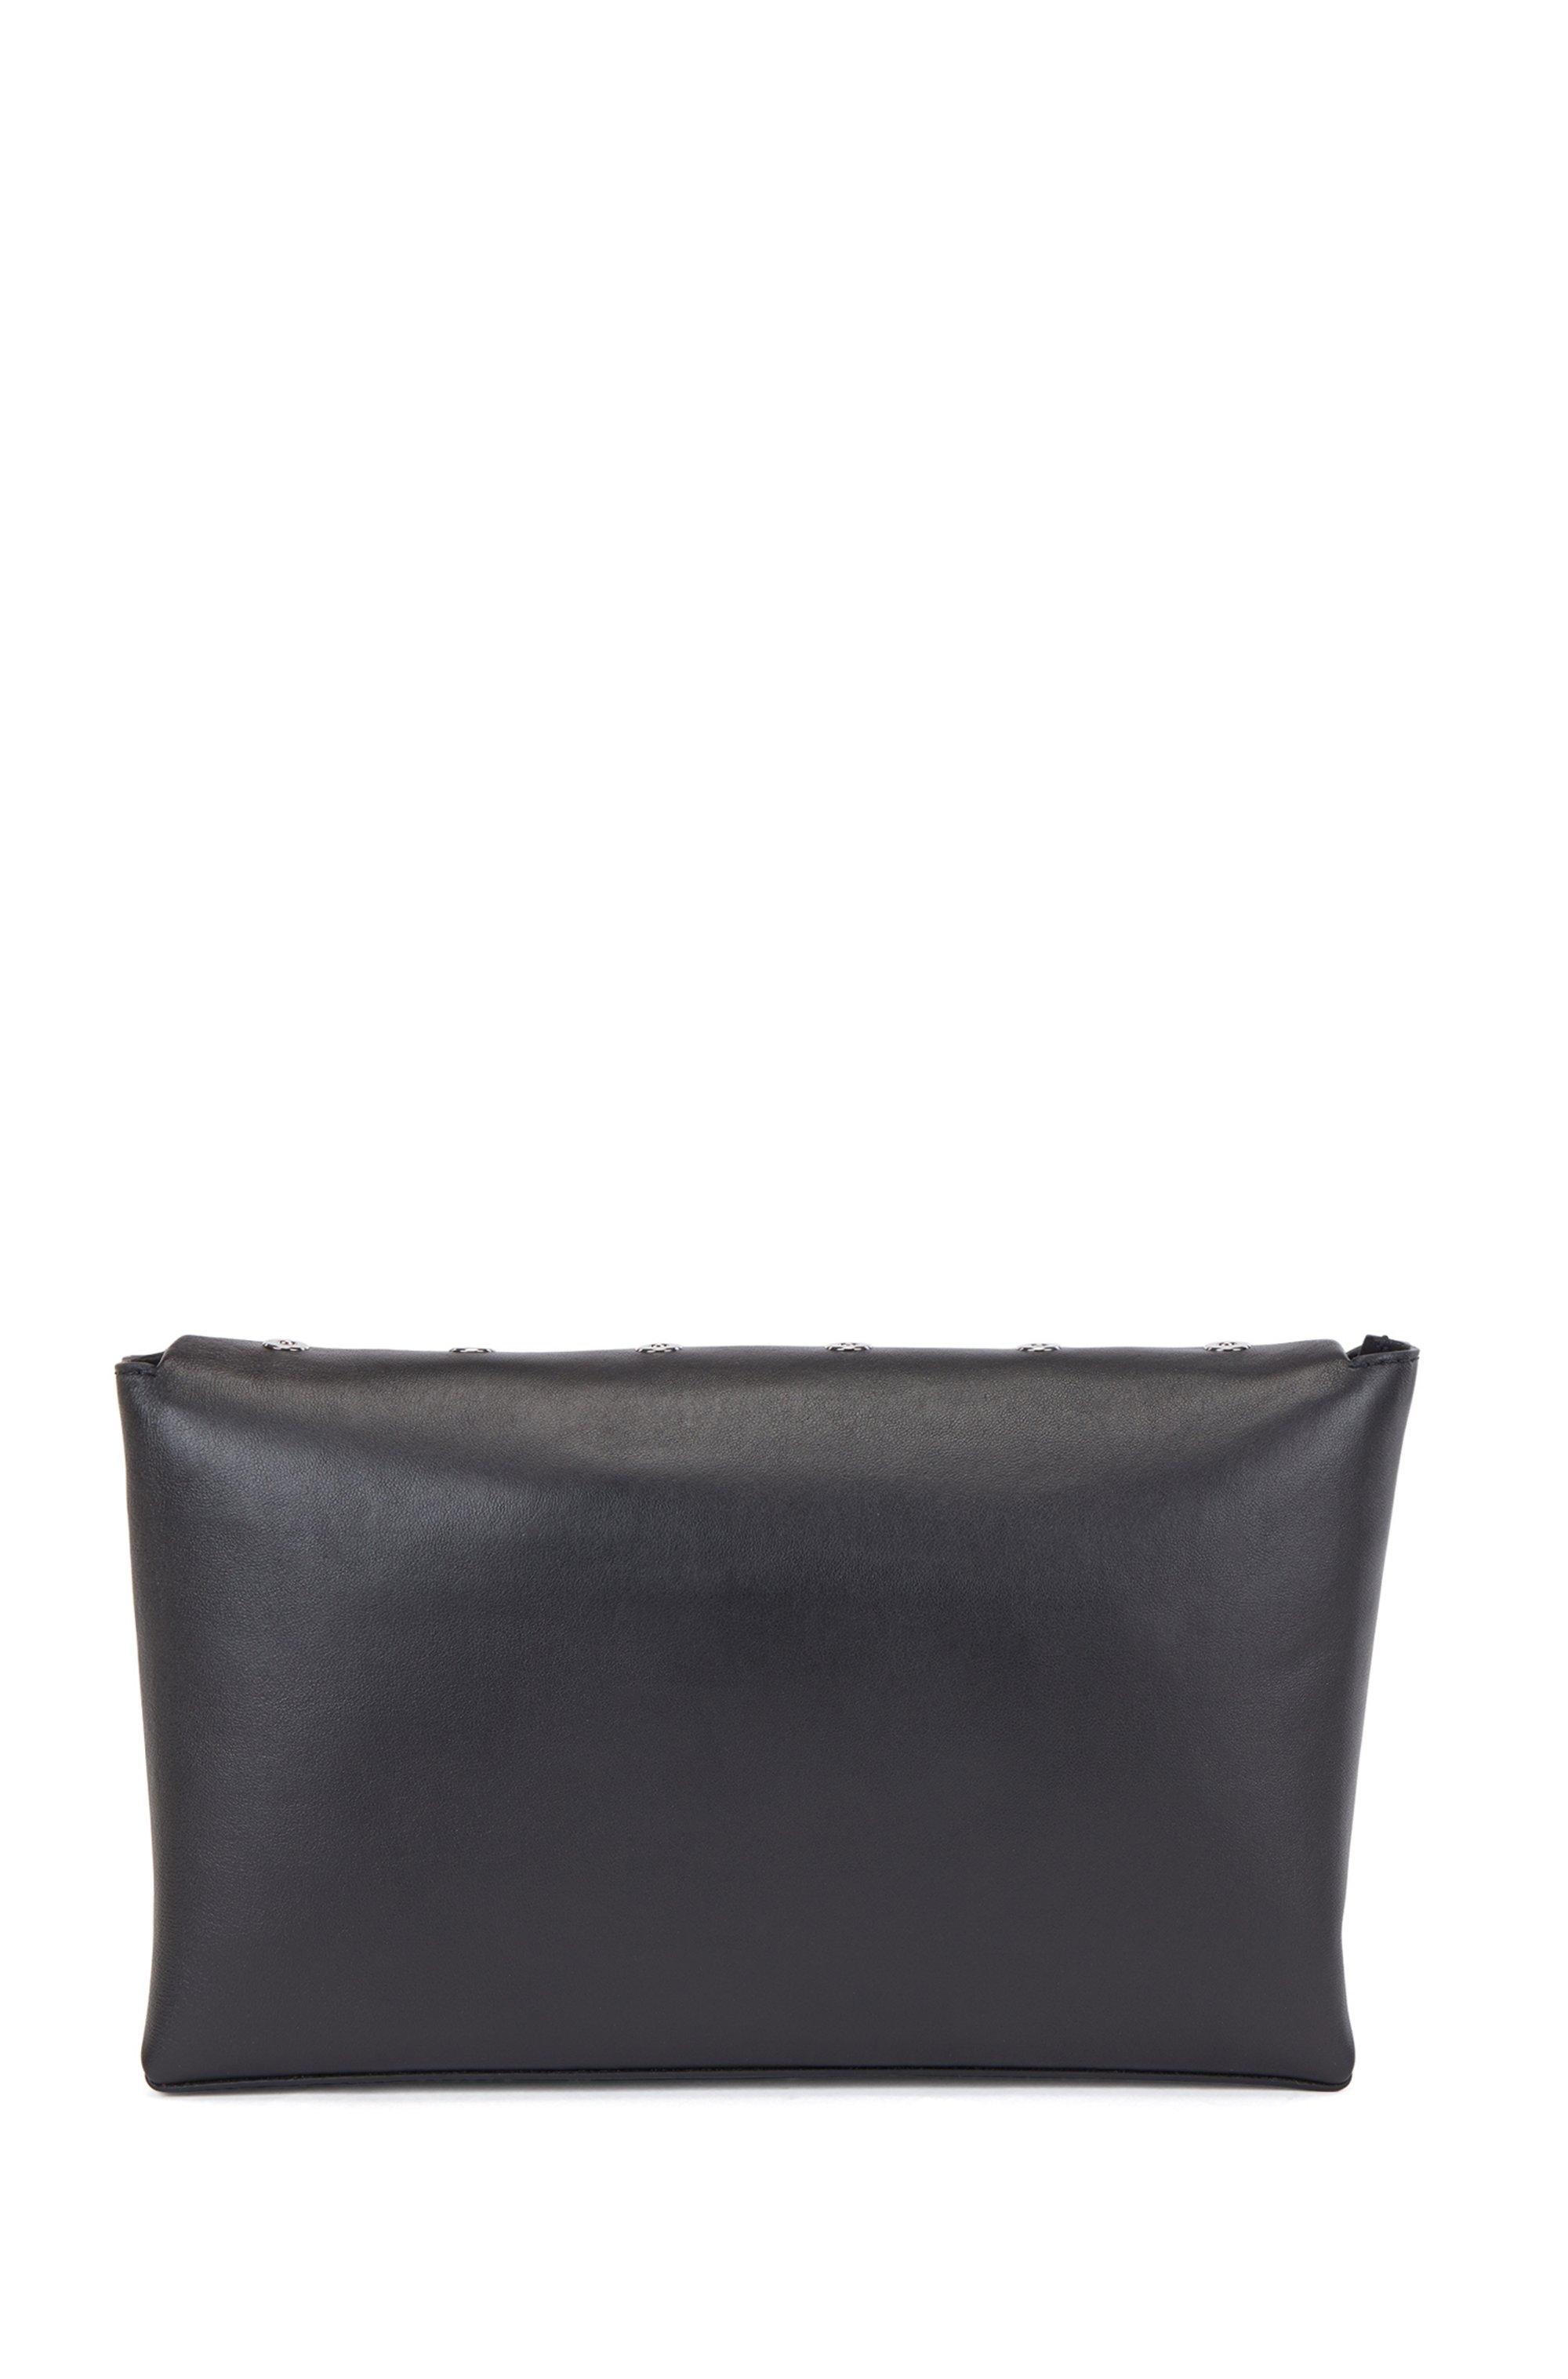 Nappa-leather clutch bag with metallic eyelets